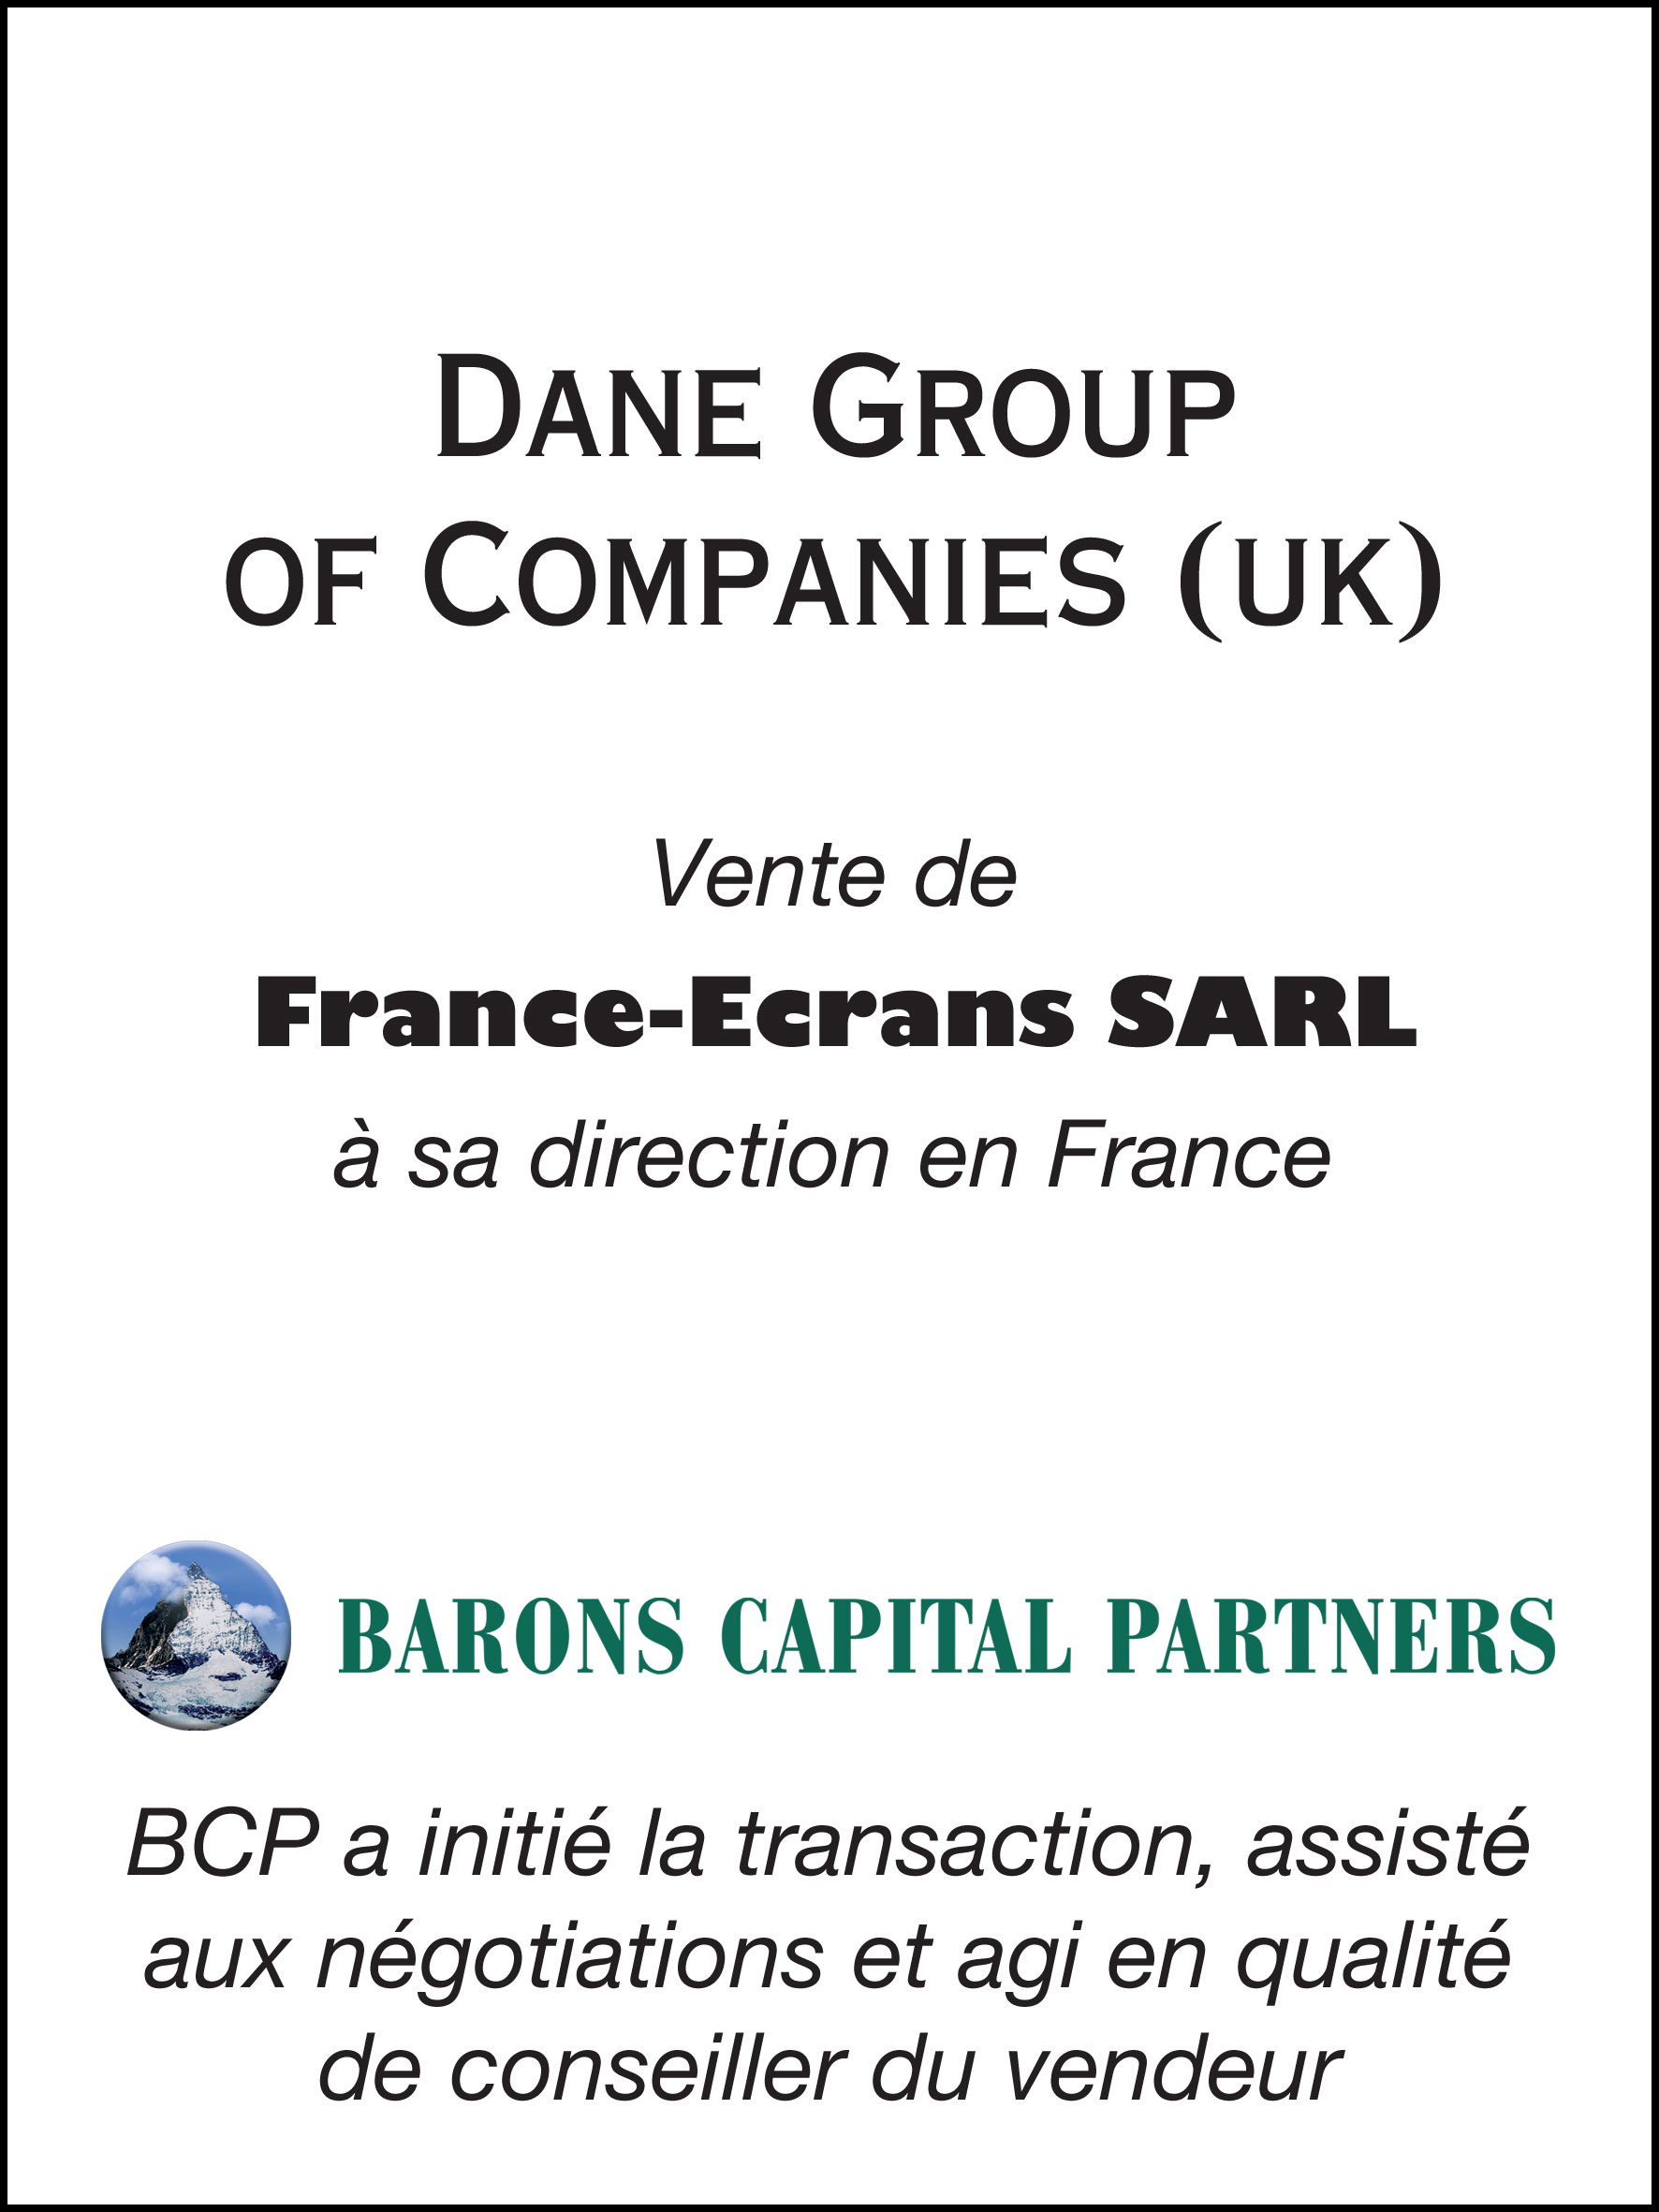 24_Dane Group of Companies (UK)_F